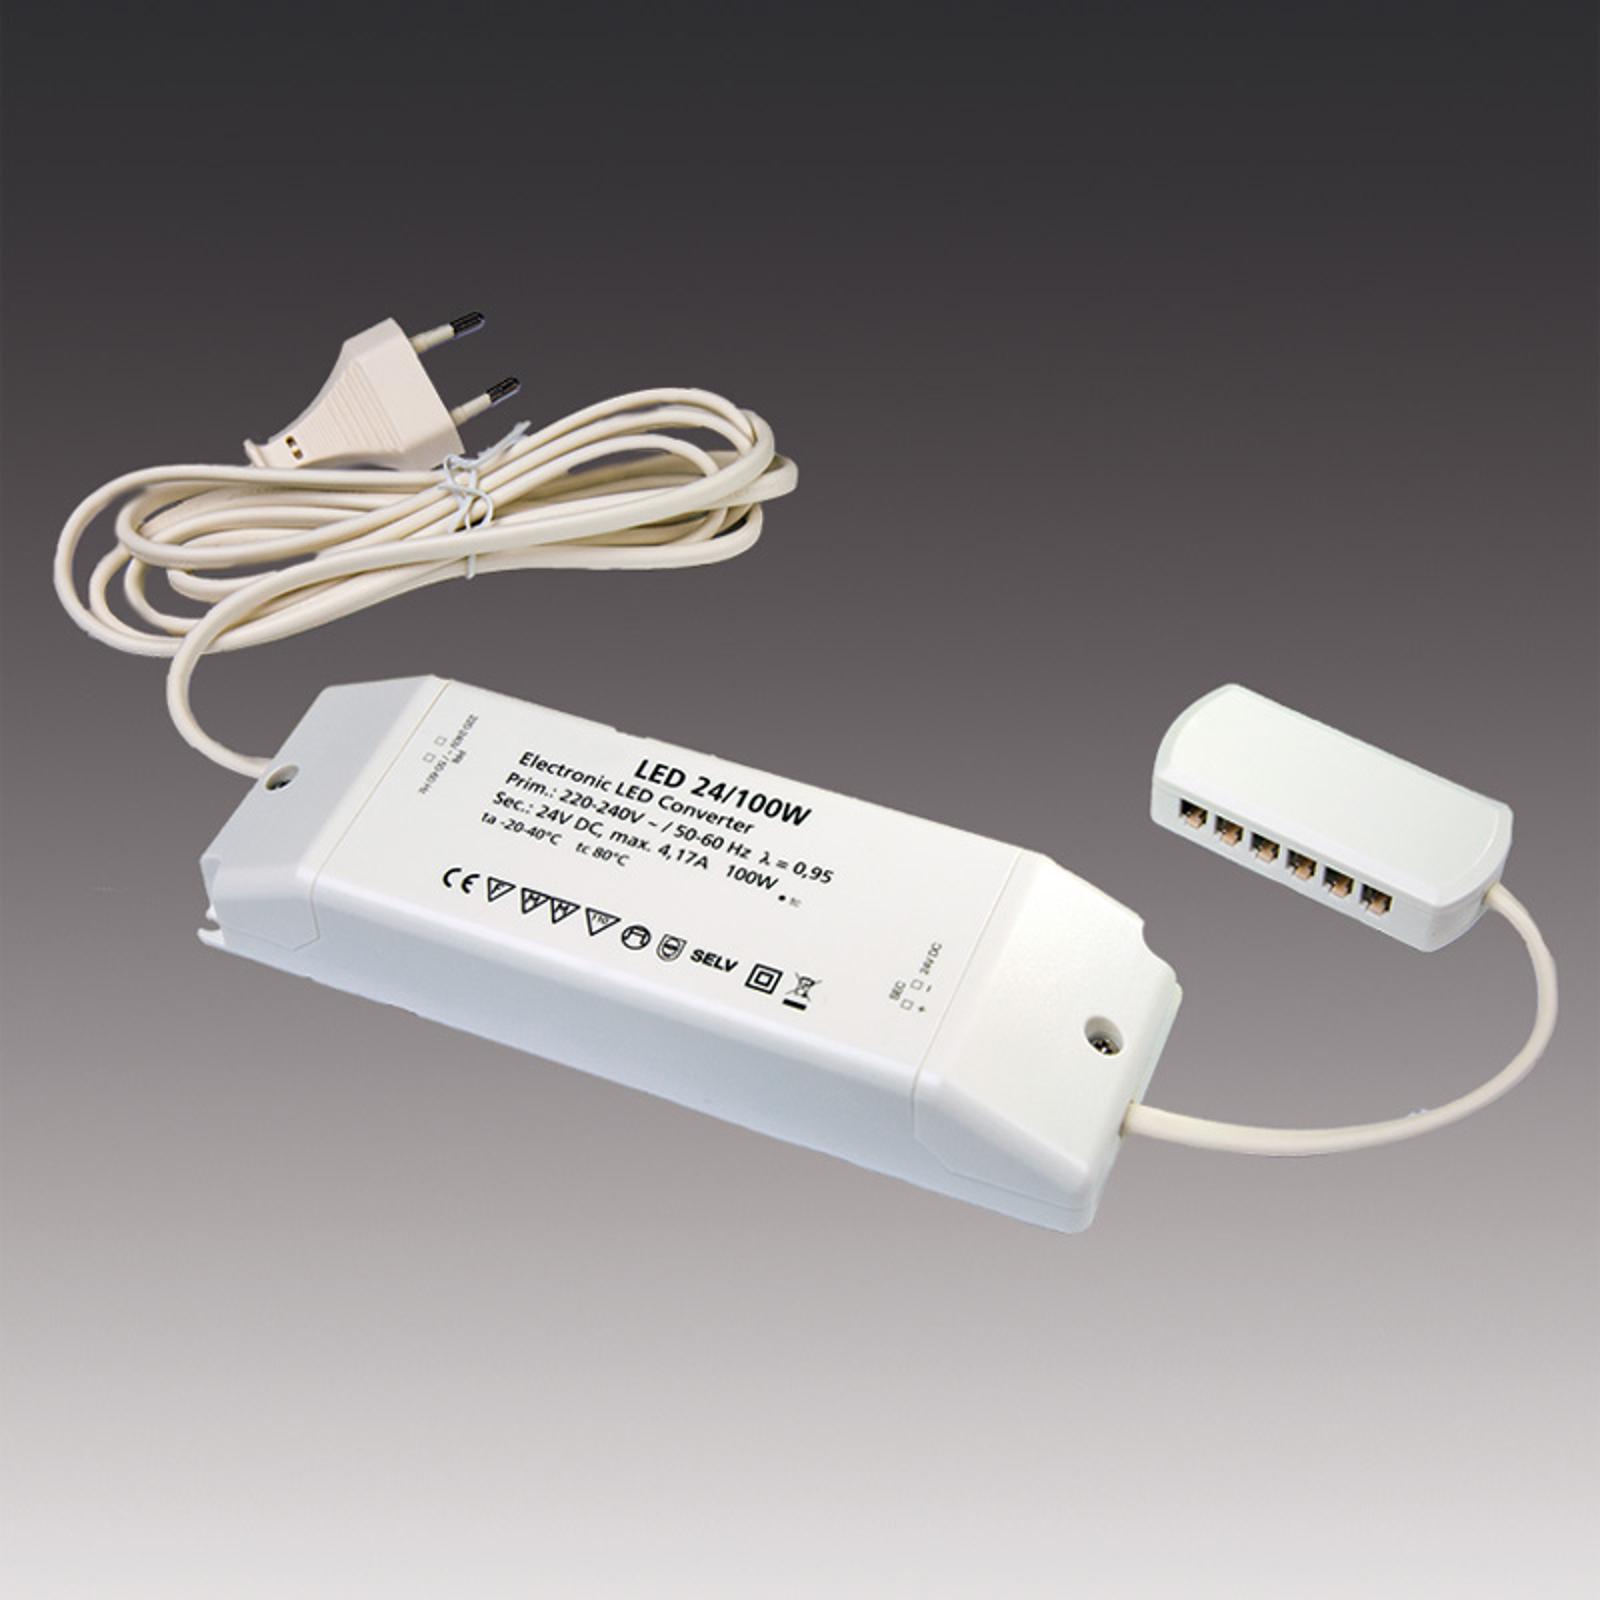 Transformateur LED 24/100W DC 24V